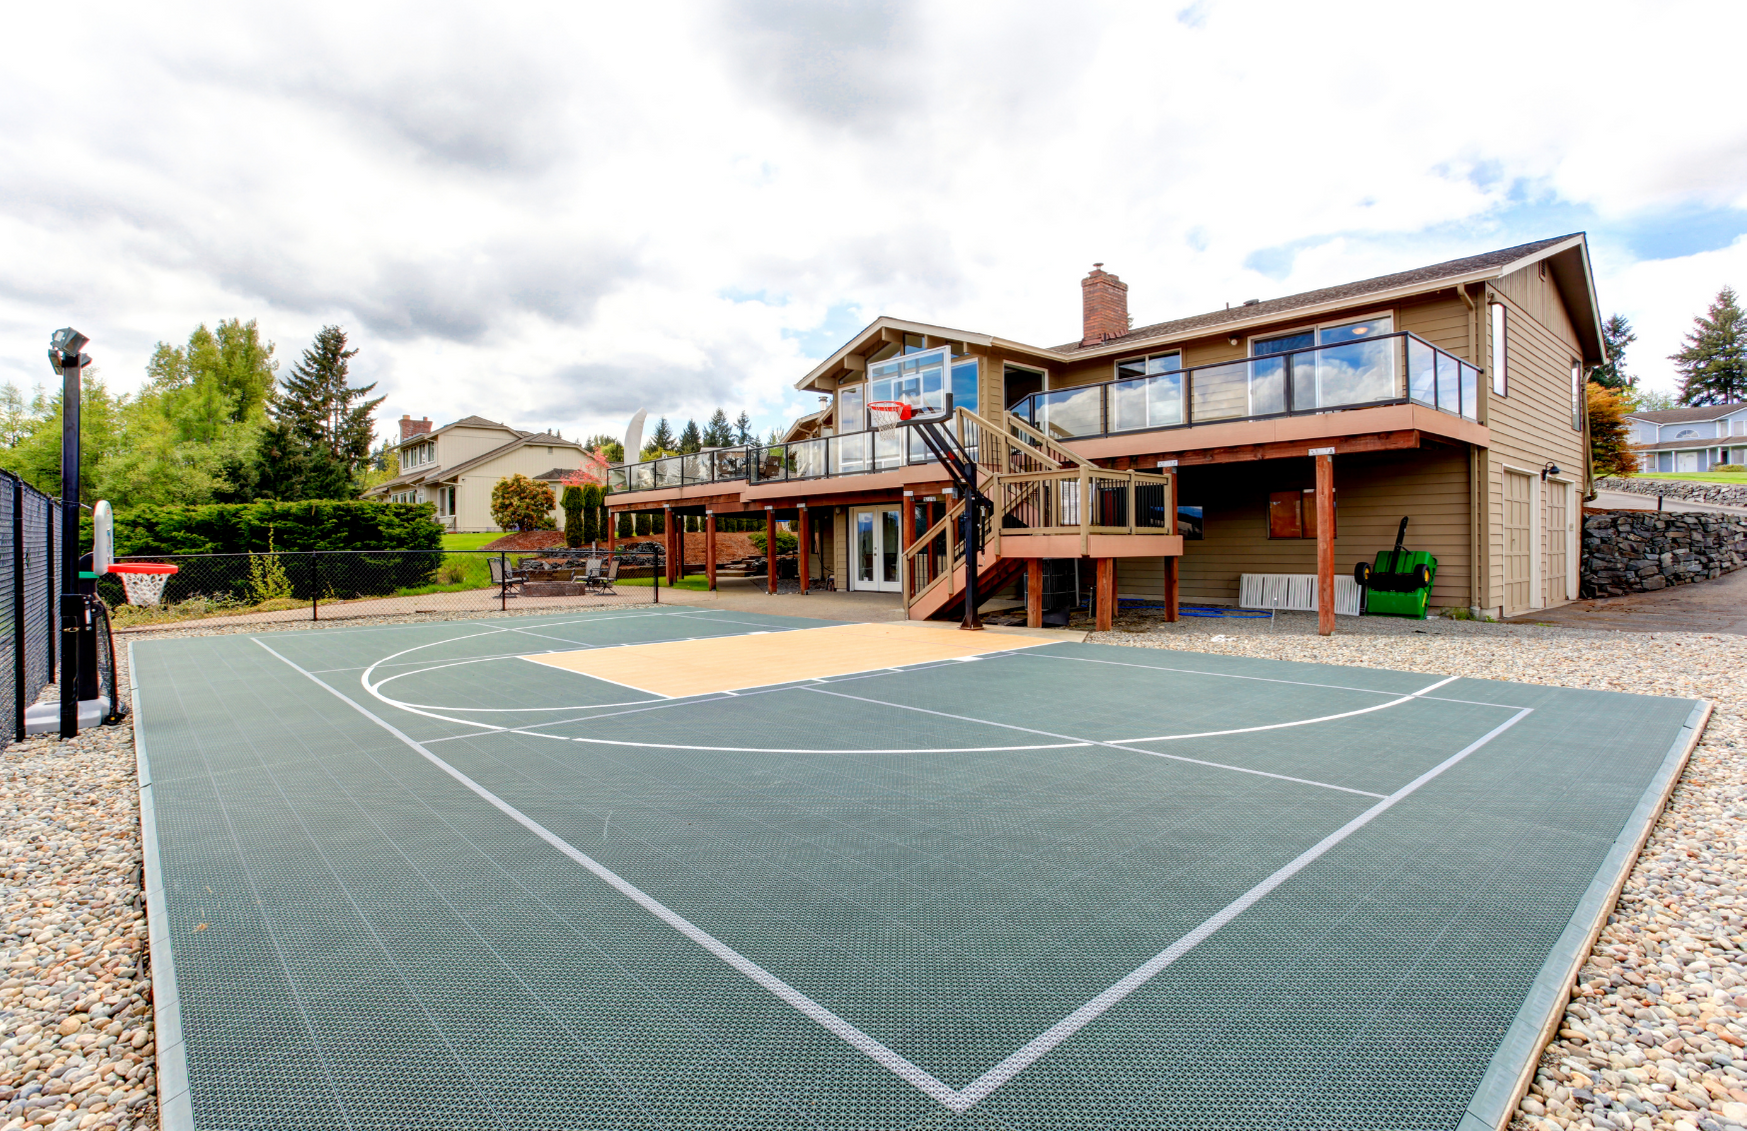 basketball court in the backyard